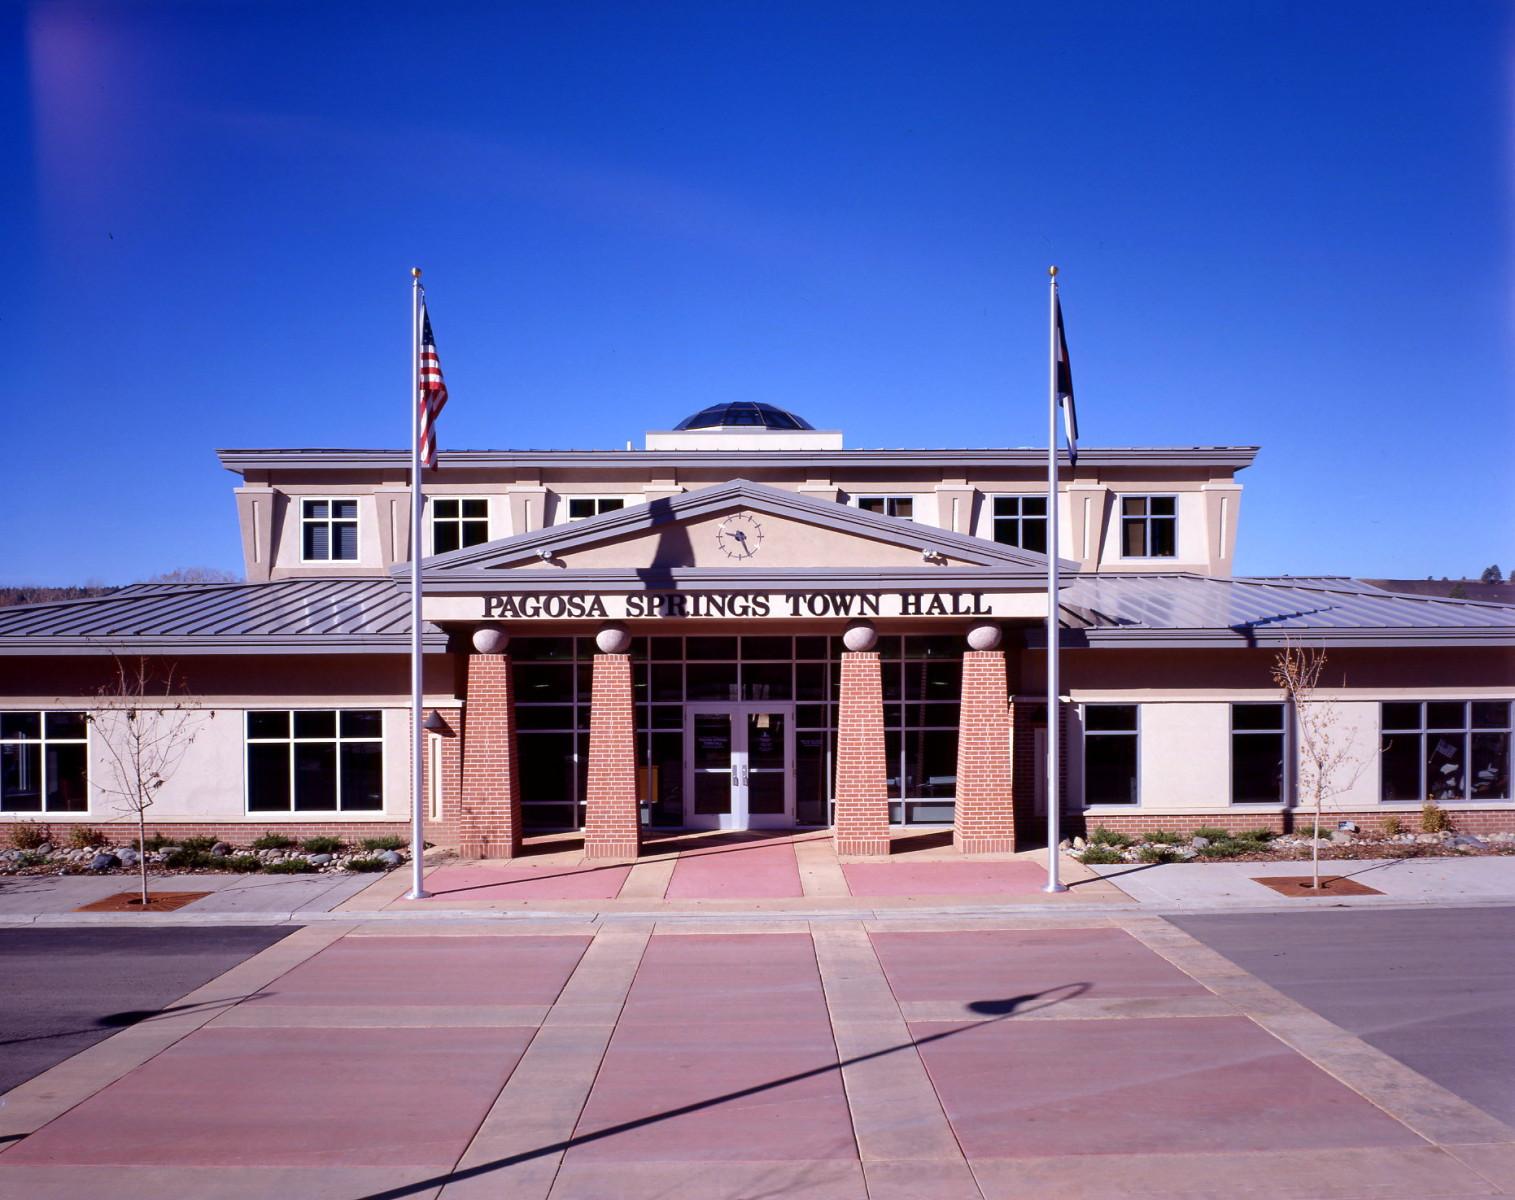 Pagosa Springs Town Hall